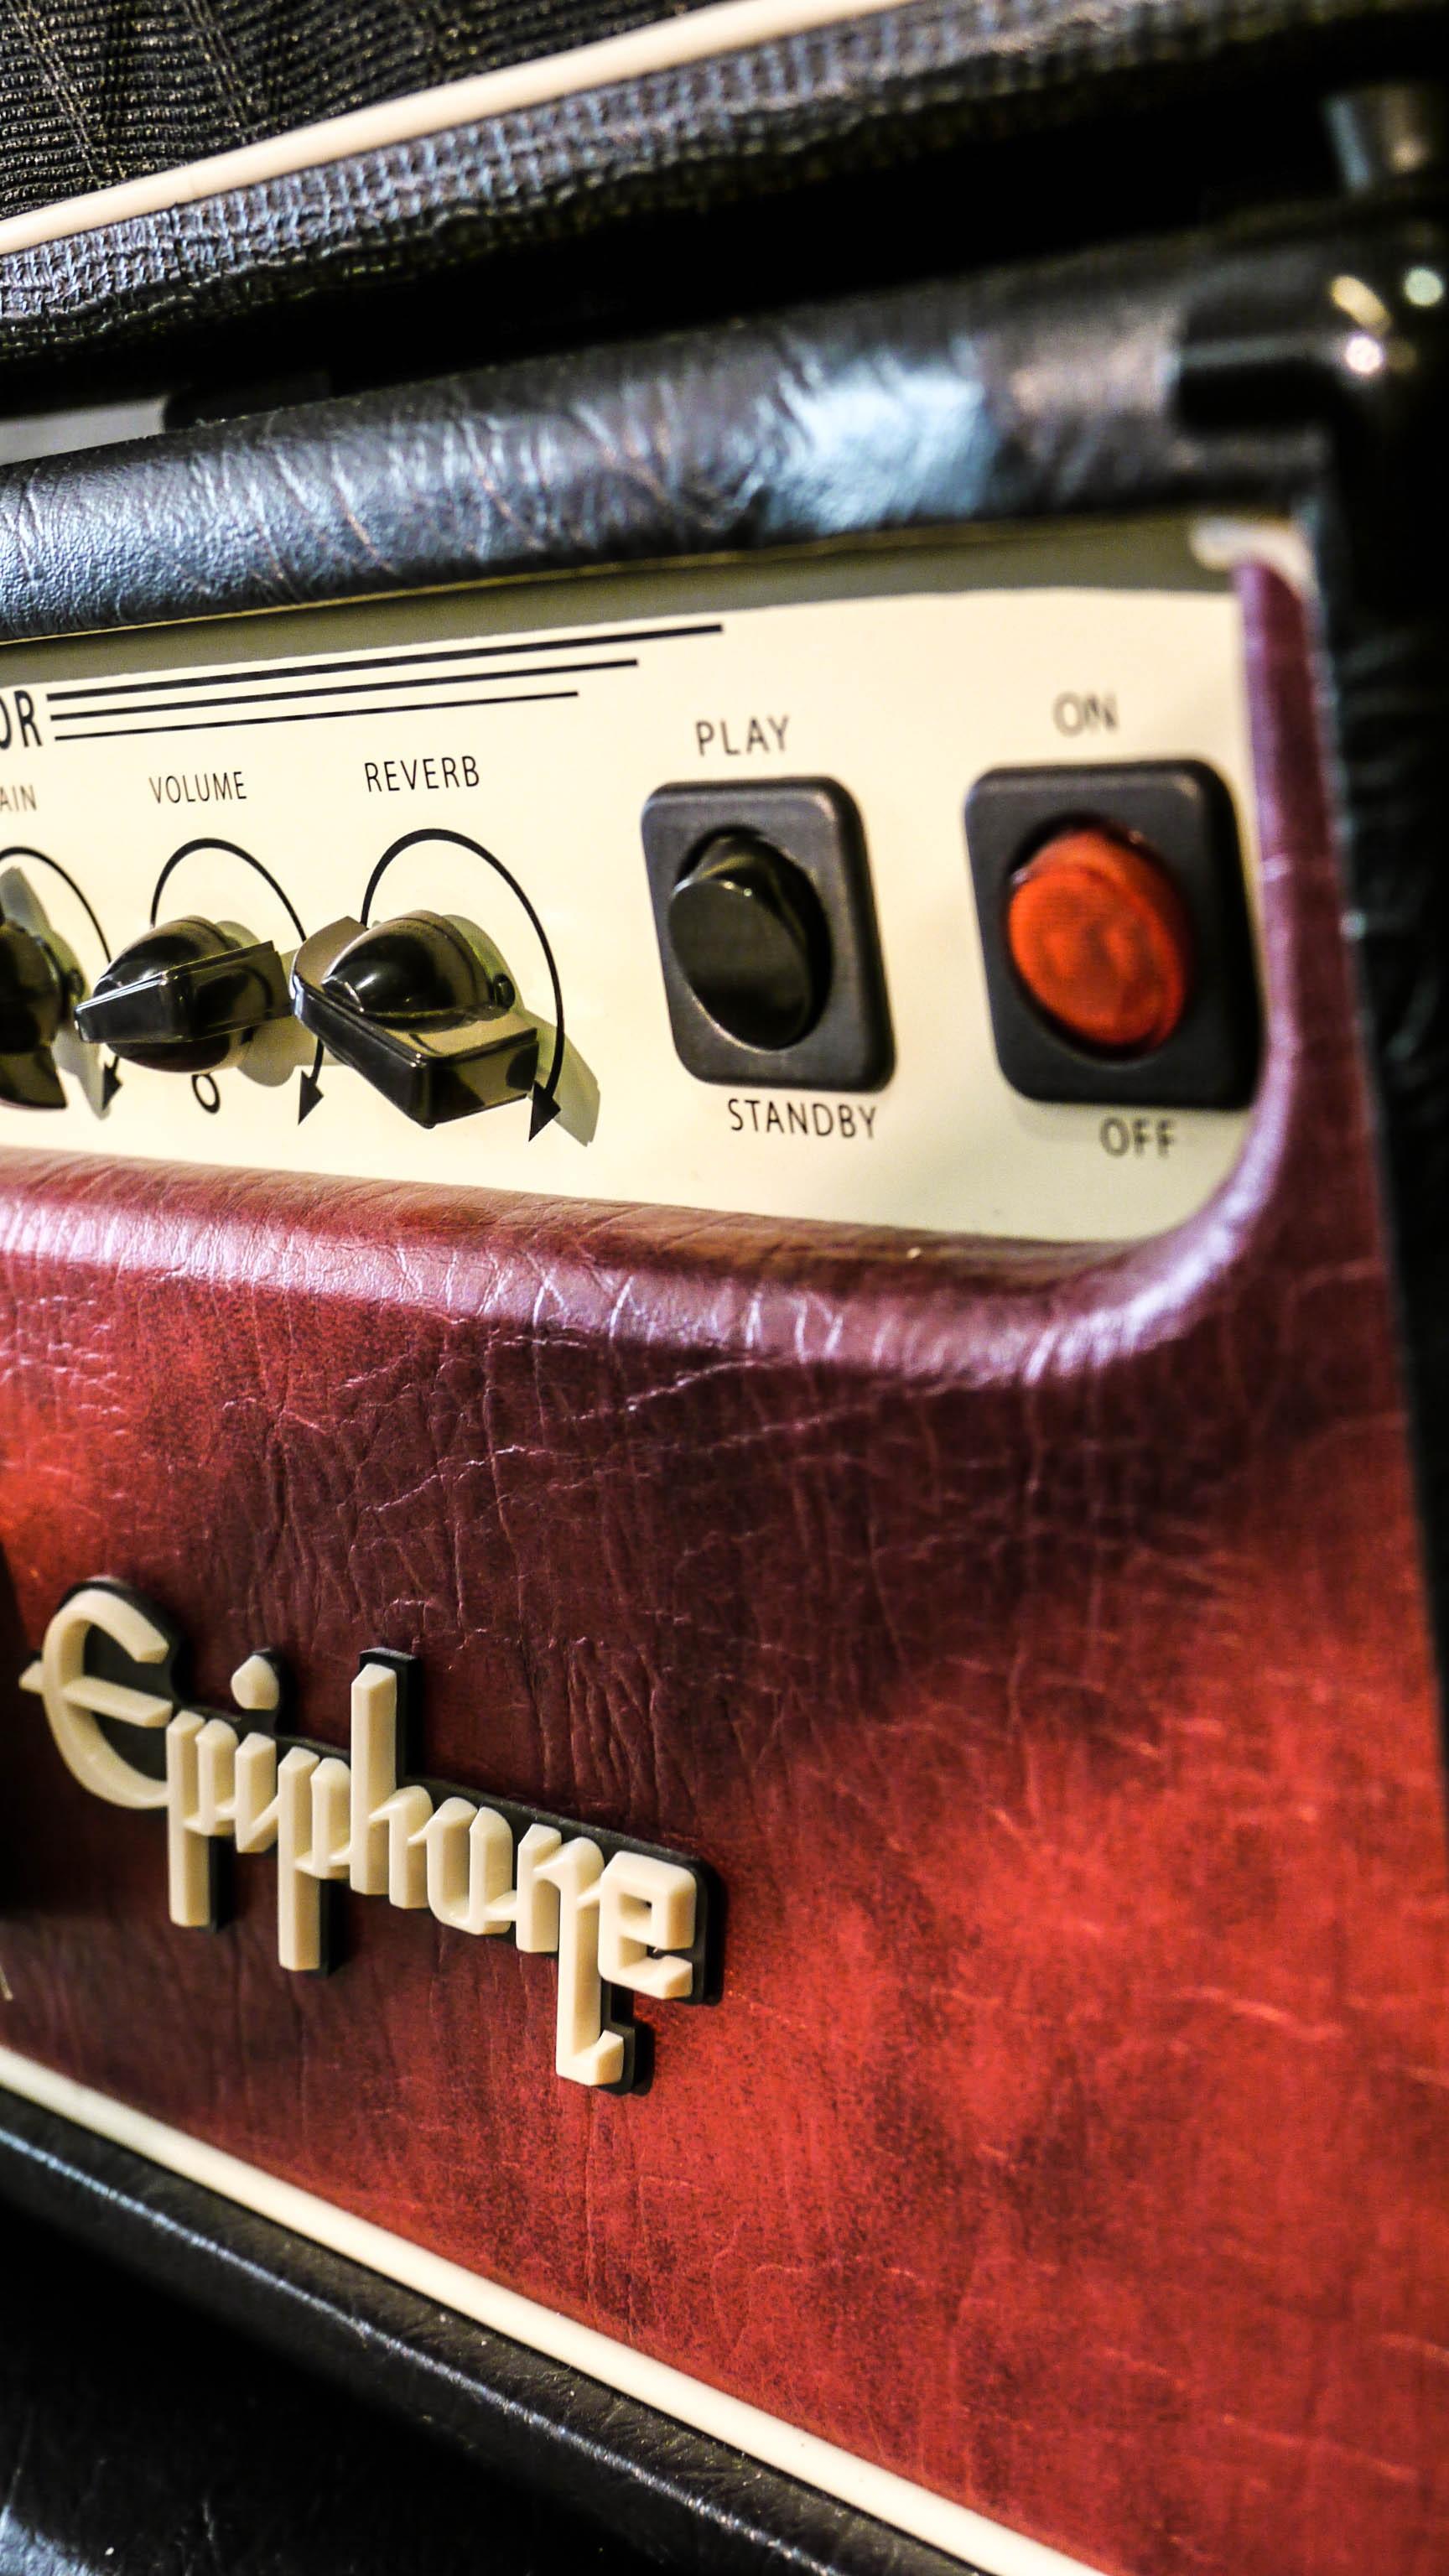 Free Images : car, guitar, red, amp, electronics, epiphone ...